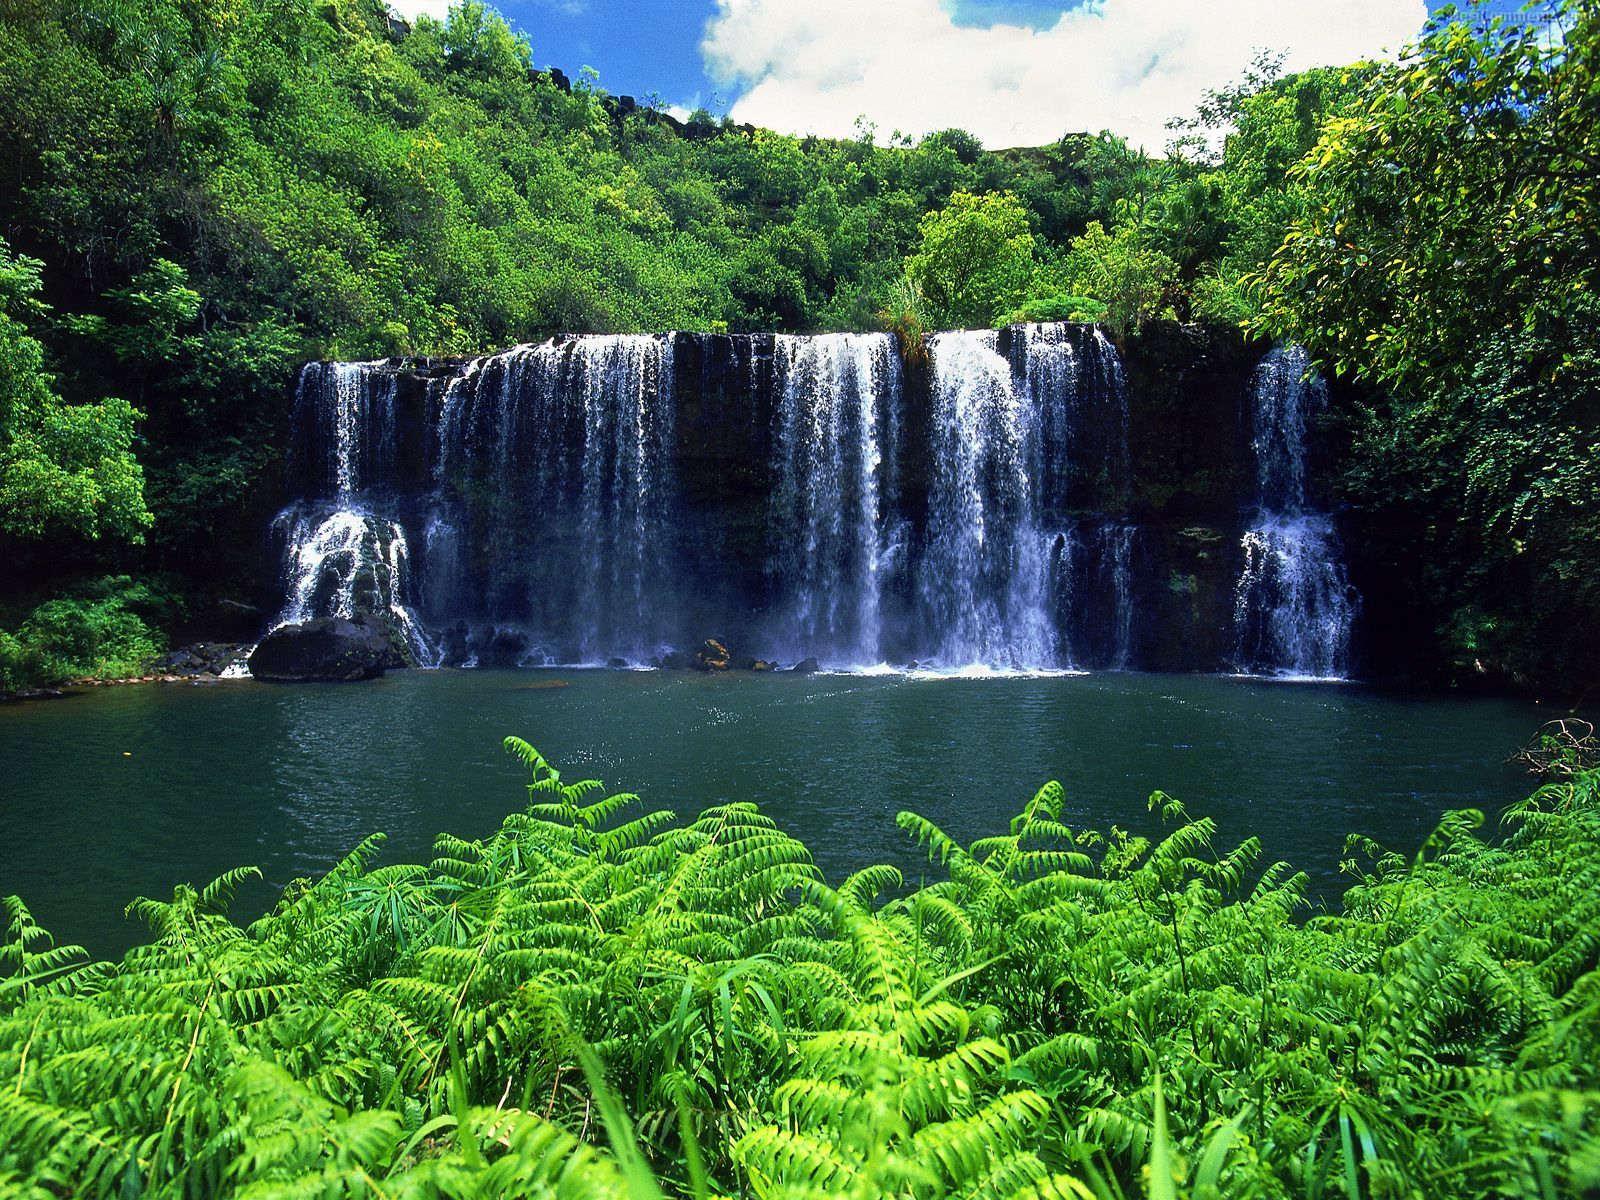 Waterfall Wallpaper 88 1600x1200